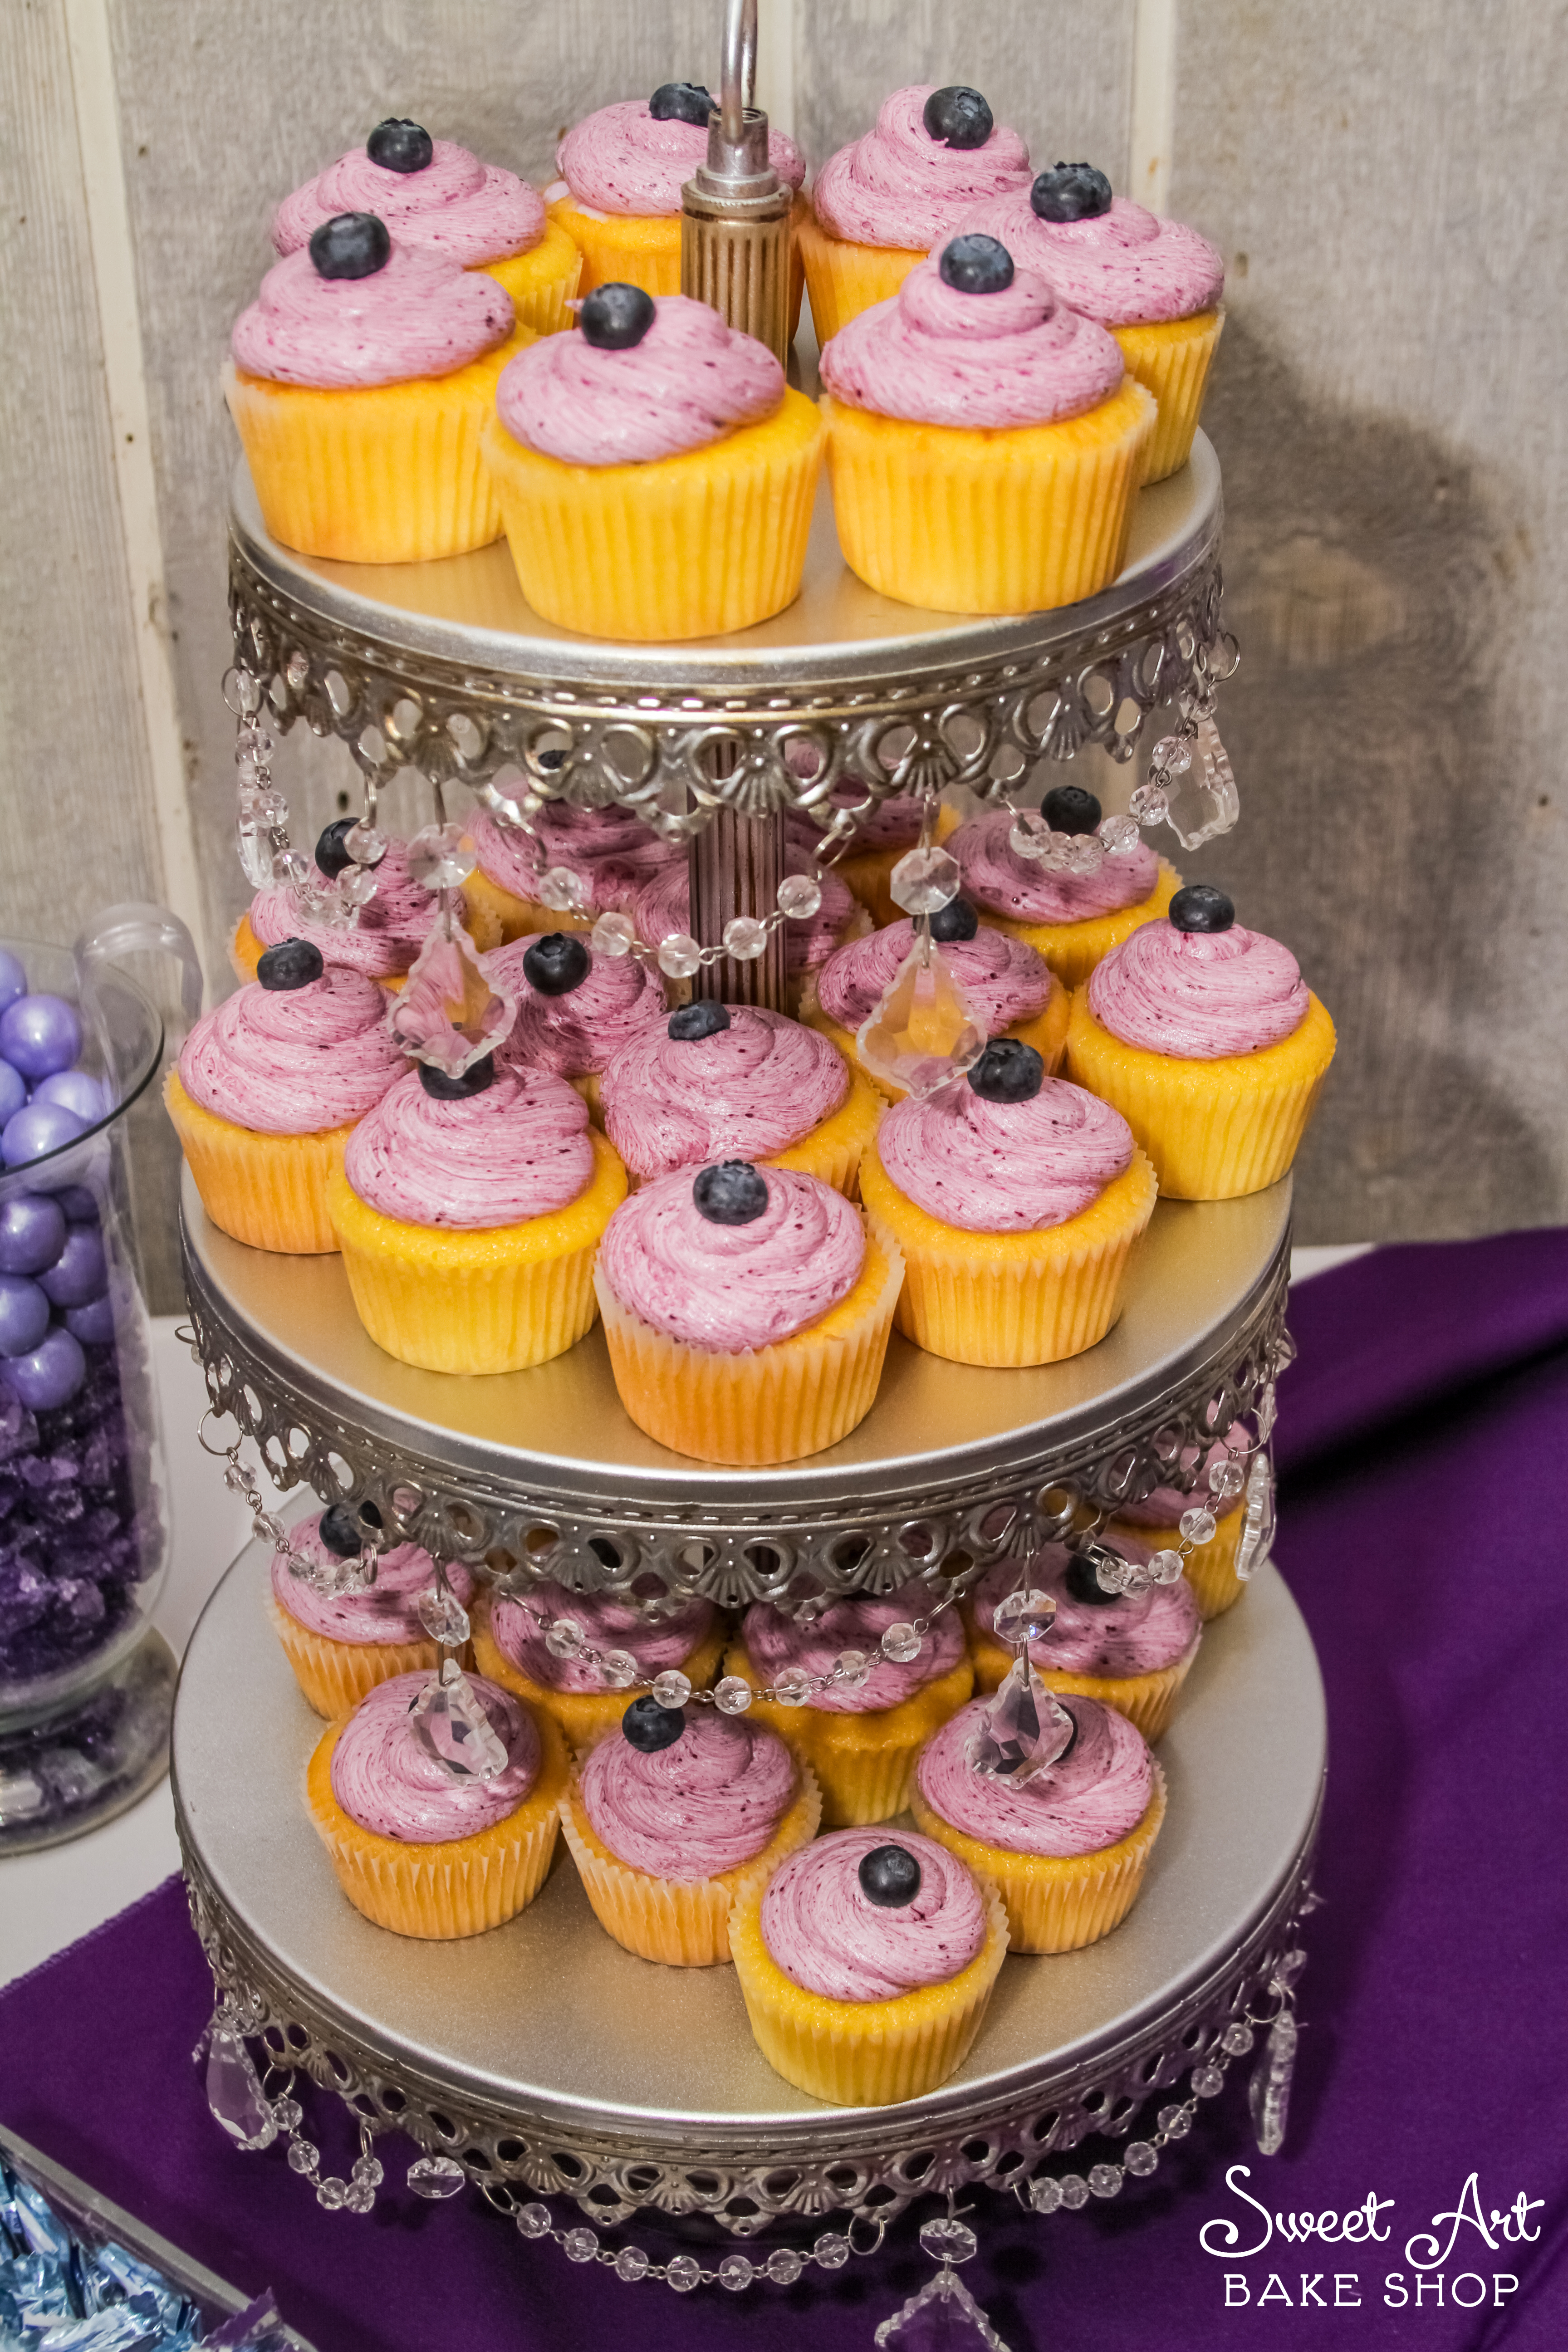 Lemon Cupcakes, Blueberry Frosting